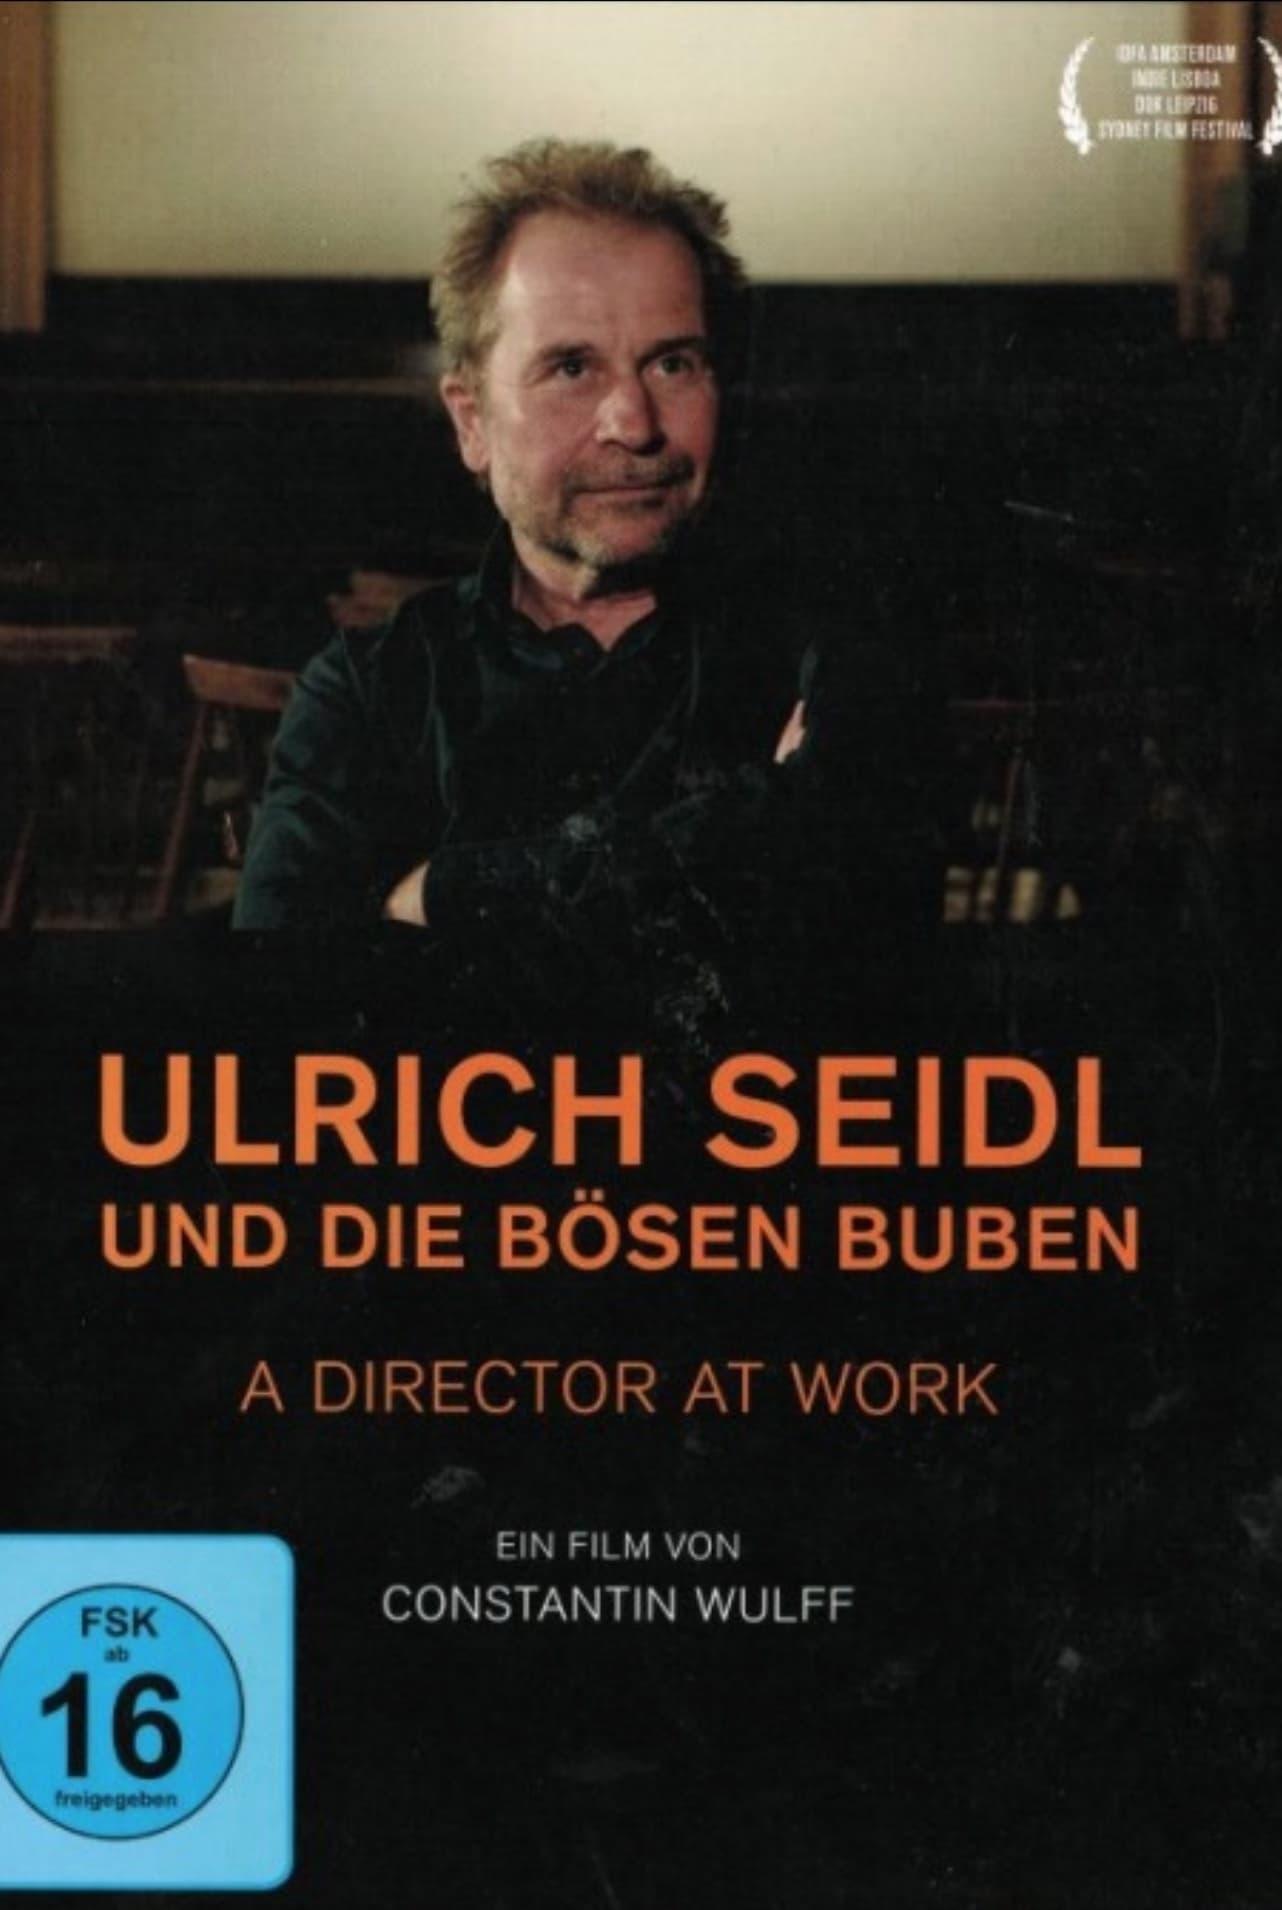 Ulrich Seidl - A Director at Work